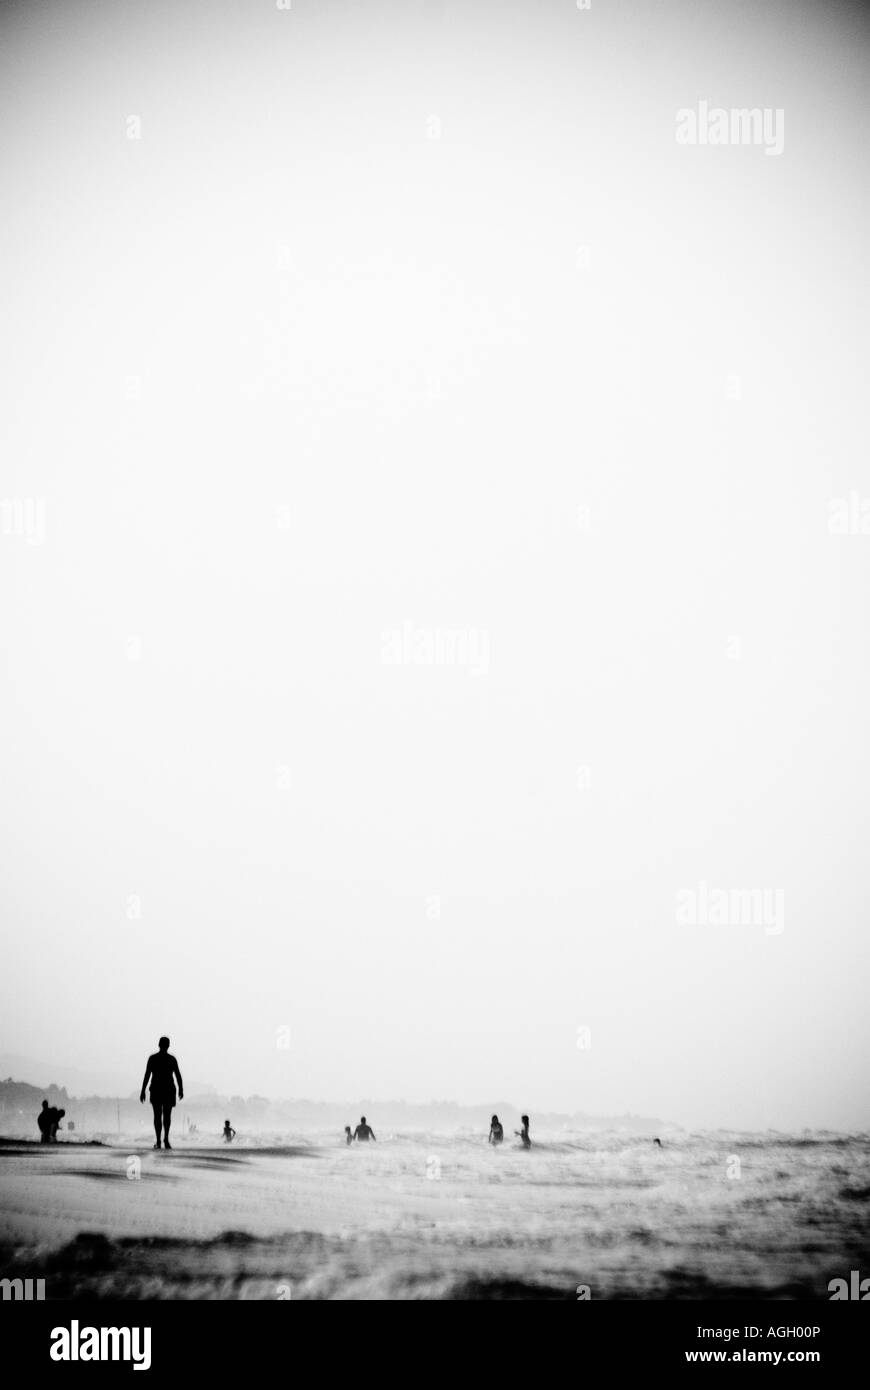 Seaside. People - Stock Image